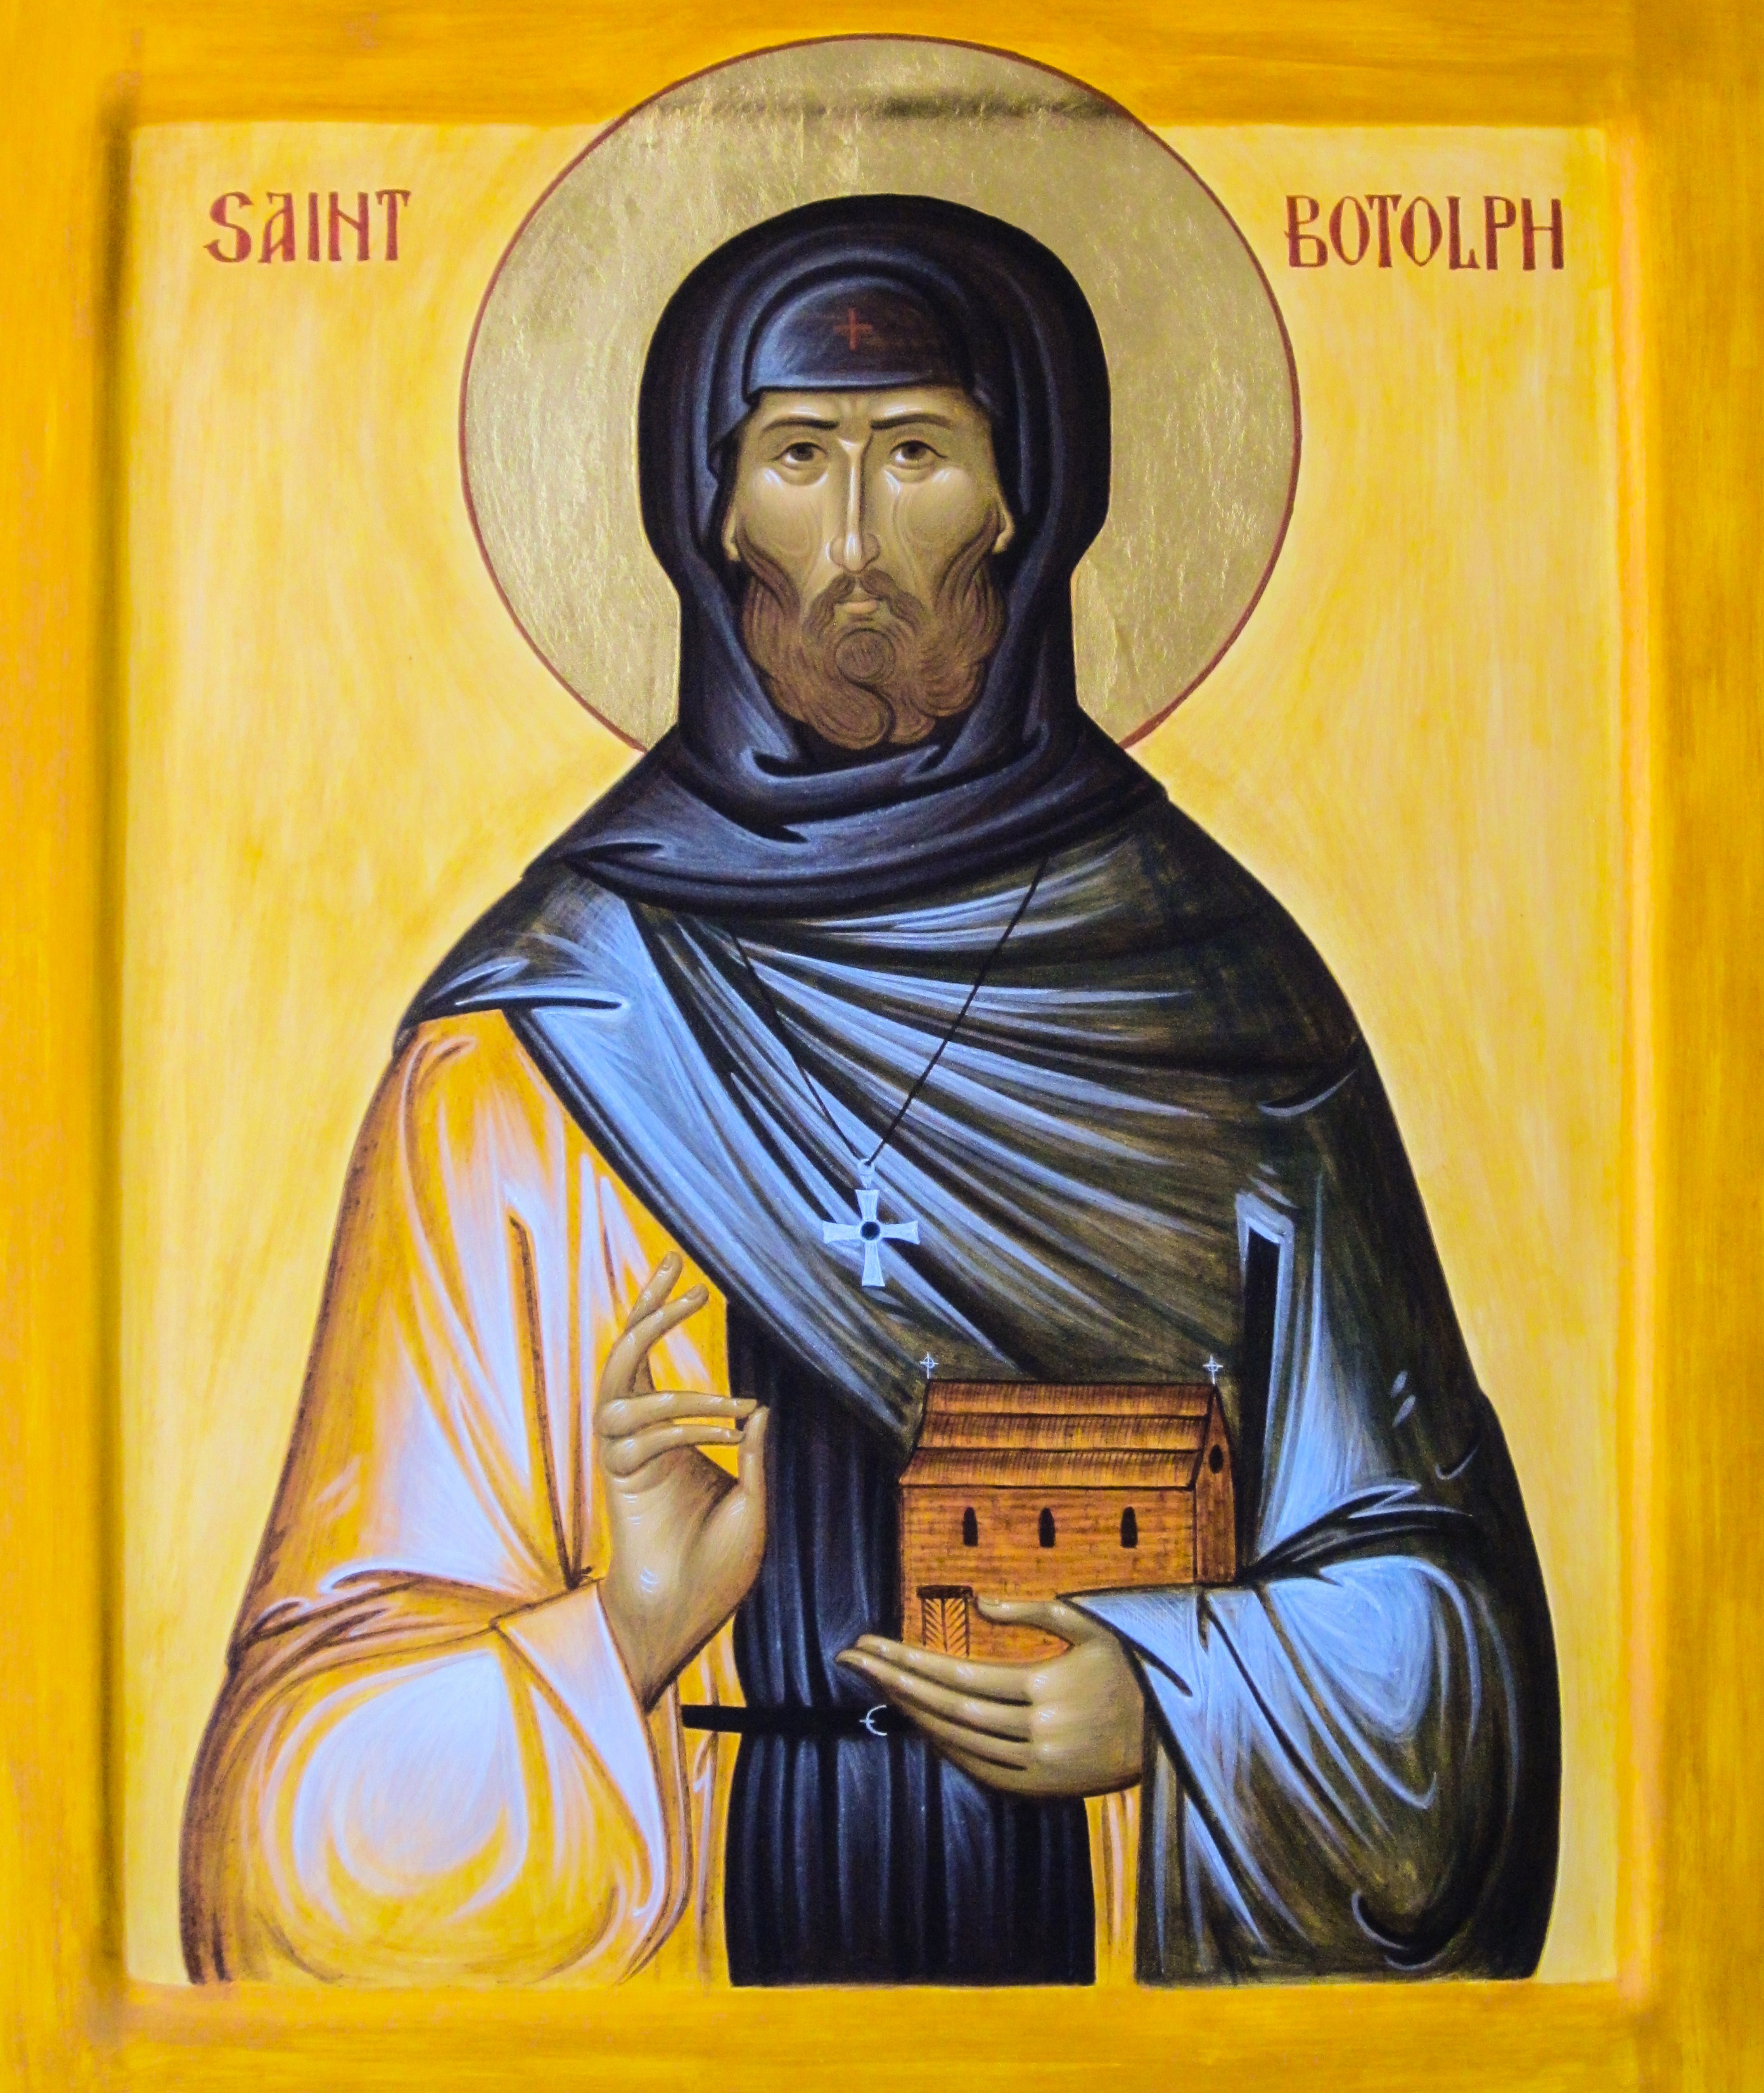 St. Botolph of Iken (sec. VII)